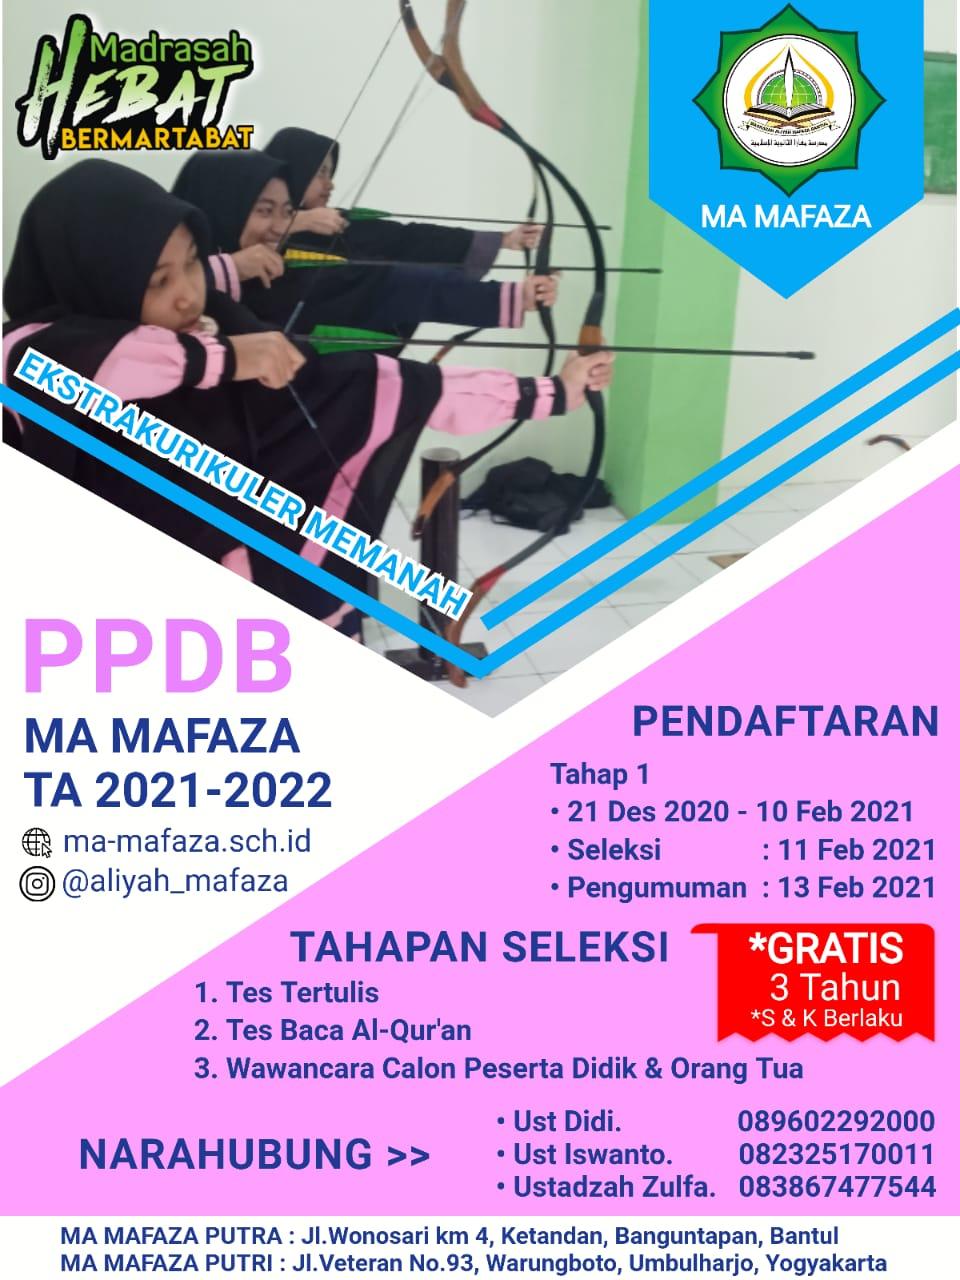 PPDB MA Mafaza Bantul - ejogja 2